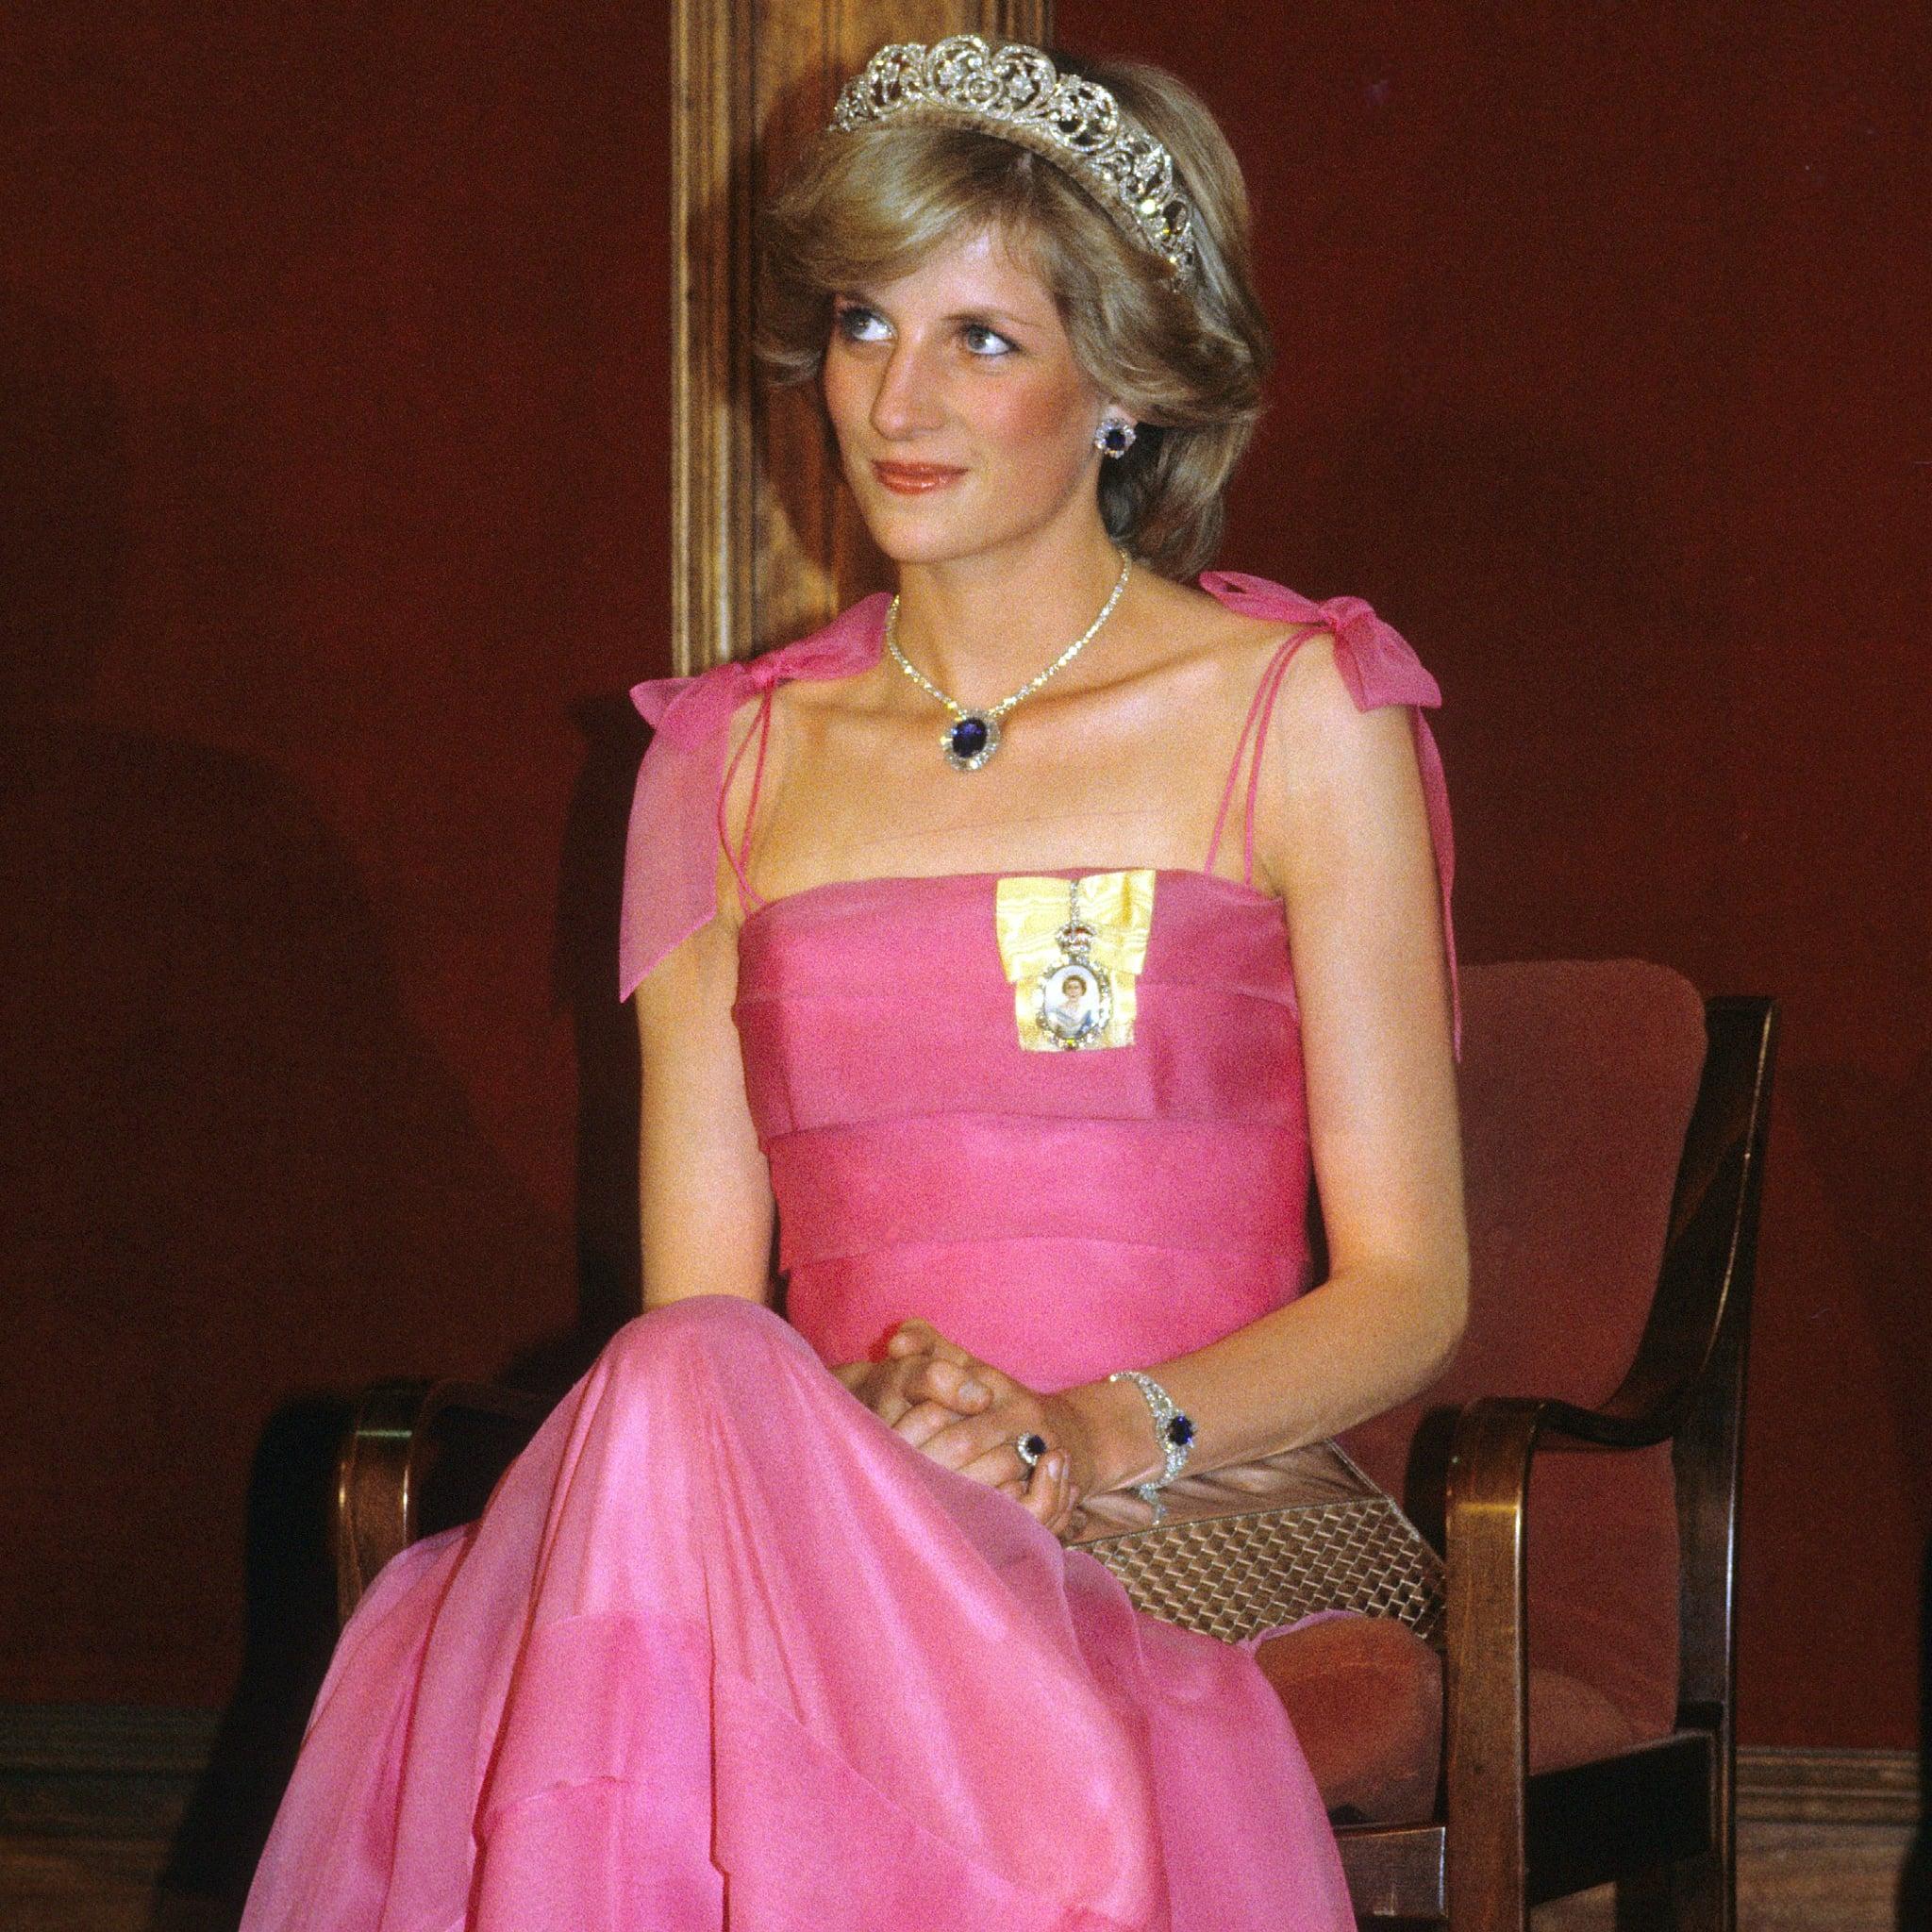 Princess Diana Halloween Costume Ideas | POPSUGAR Celebrity